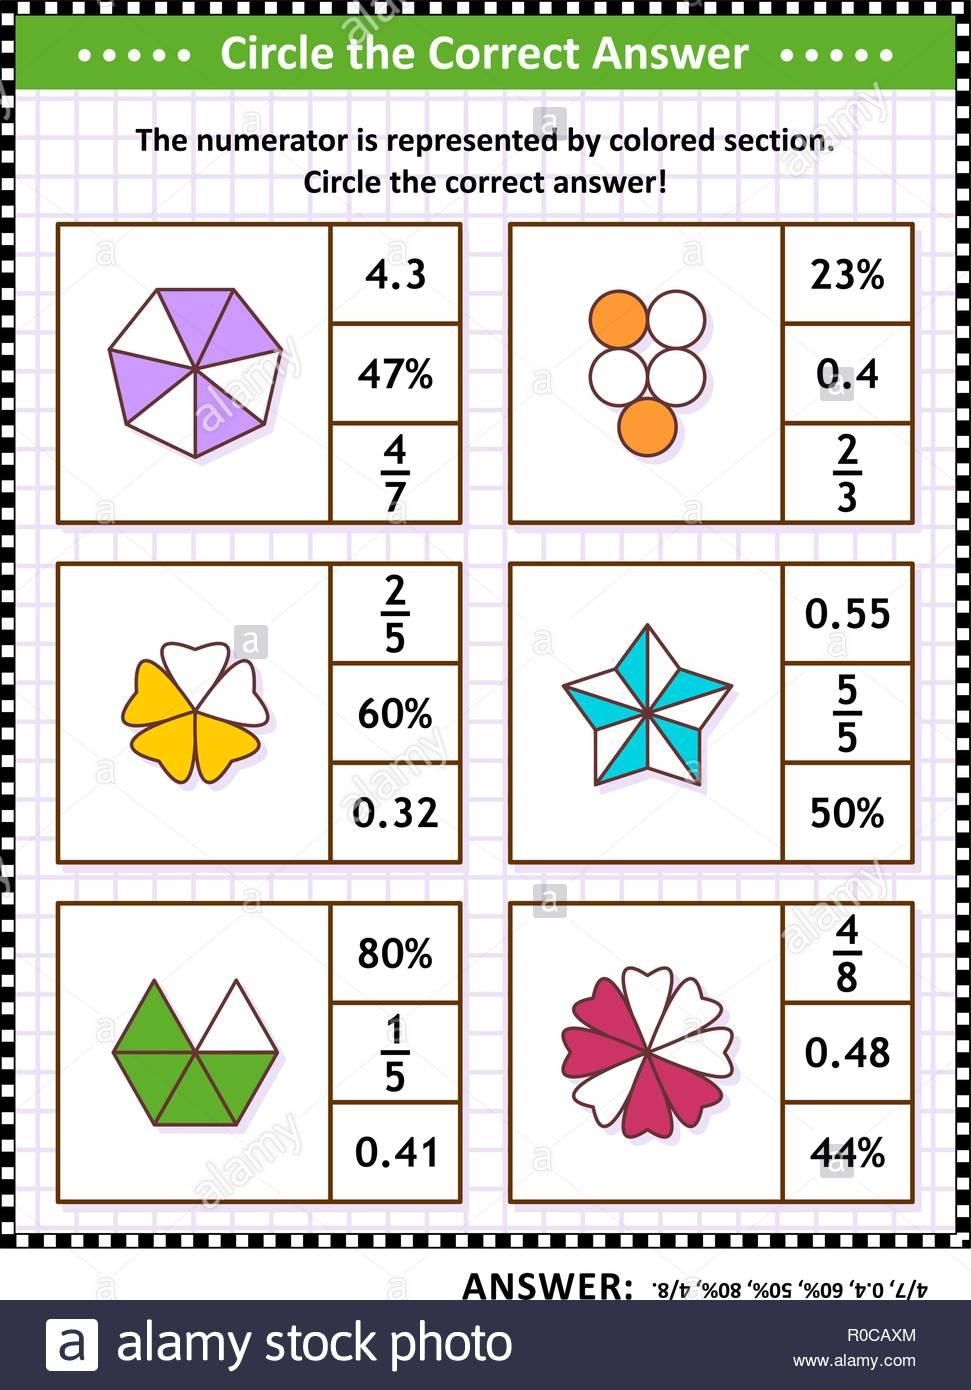 Math Skills Training Visual Puzzle Or Worksheet. Circle The Correct - Worksheet Visual Puzzle